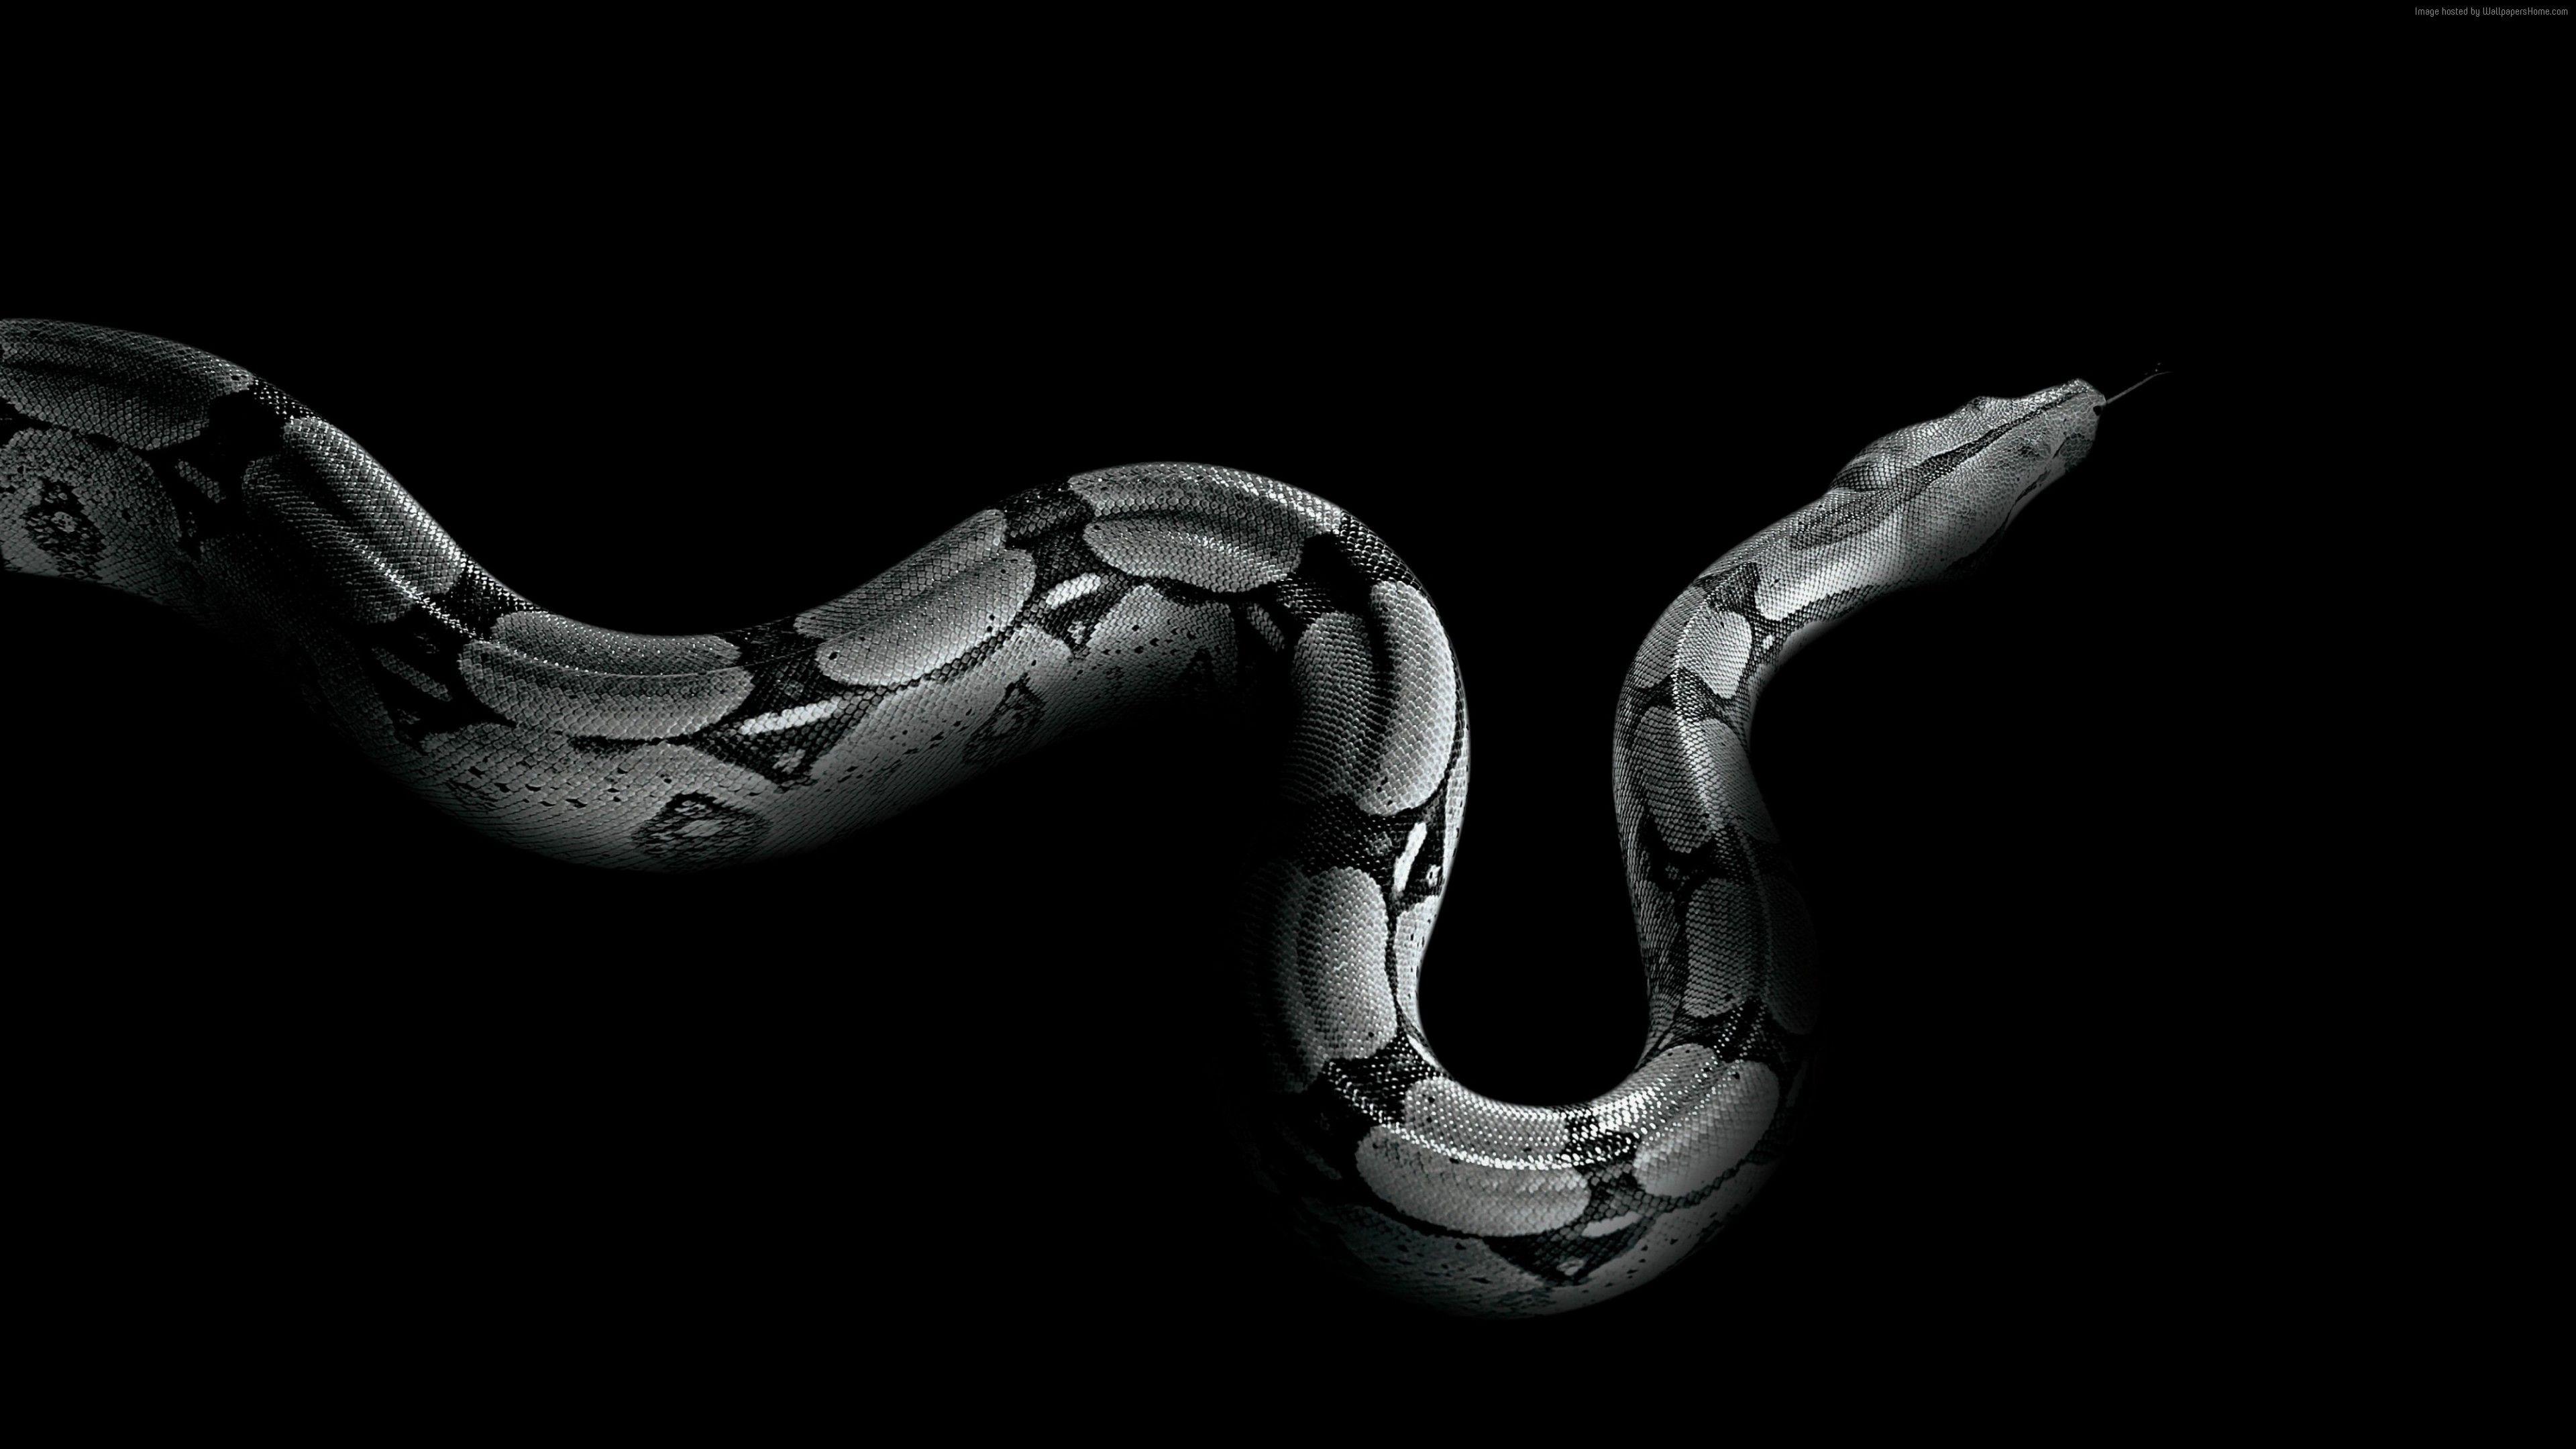 Wallpaper Python Snake Animals Snake Wallpaper Animal